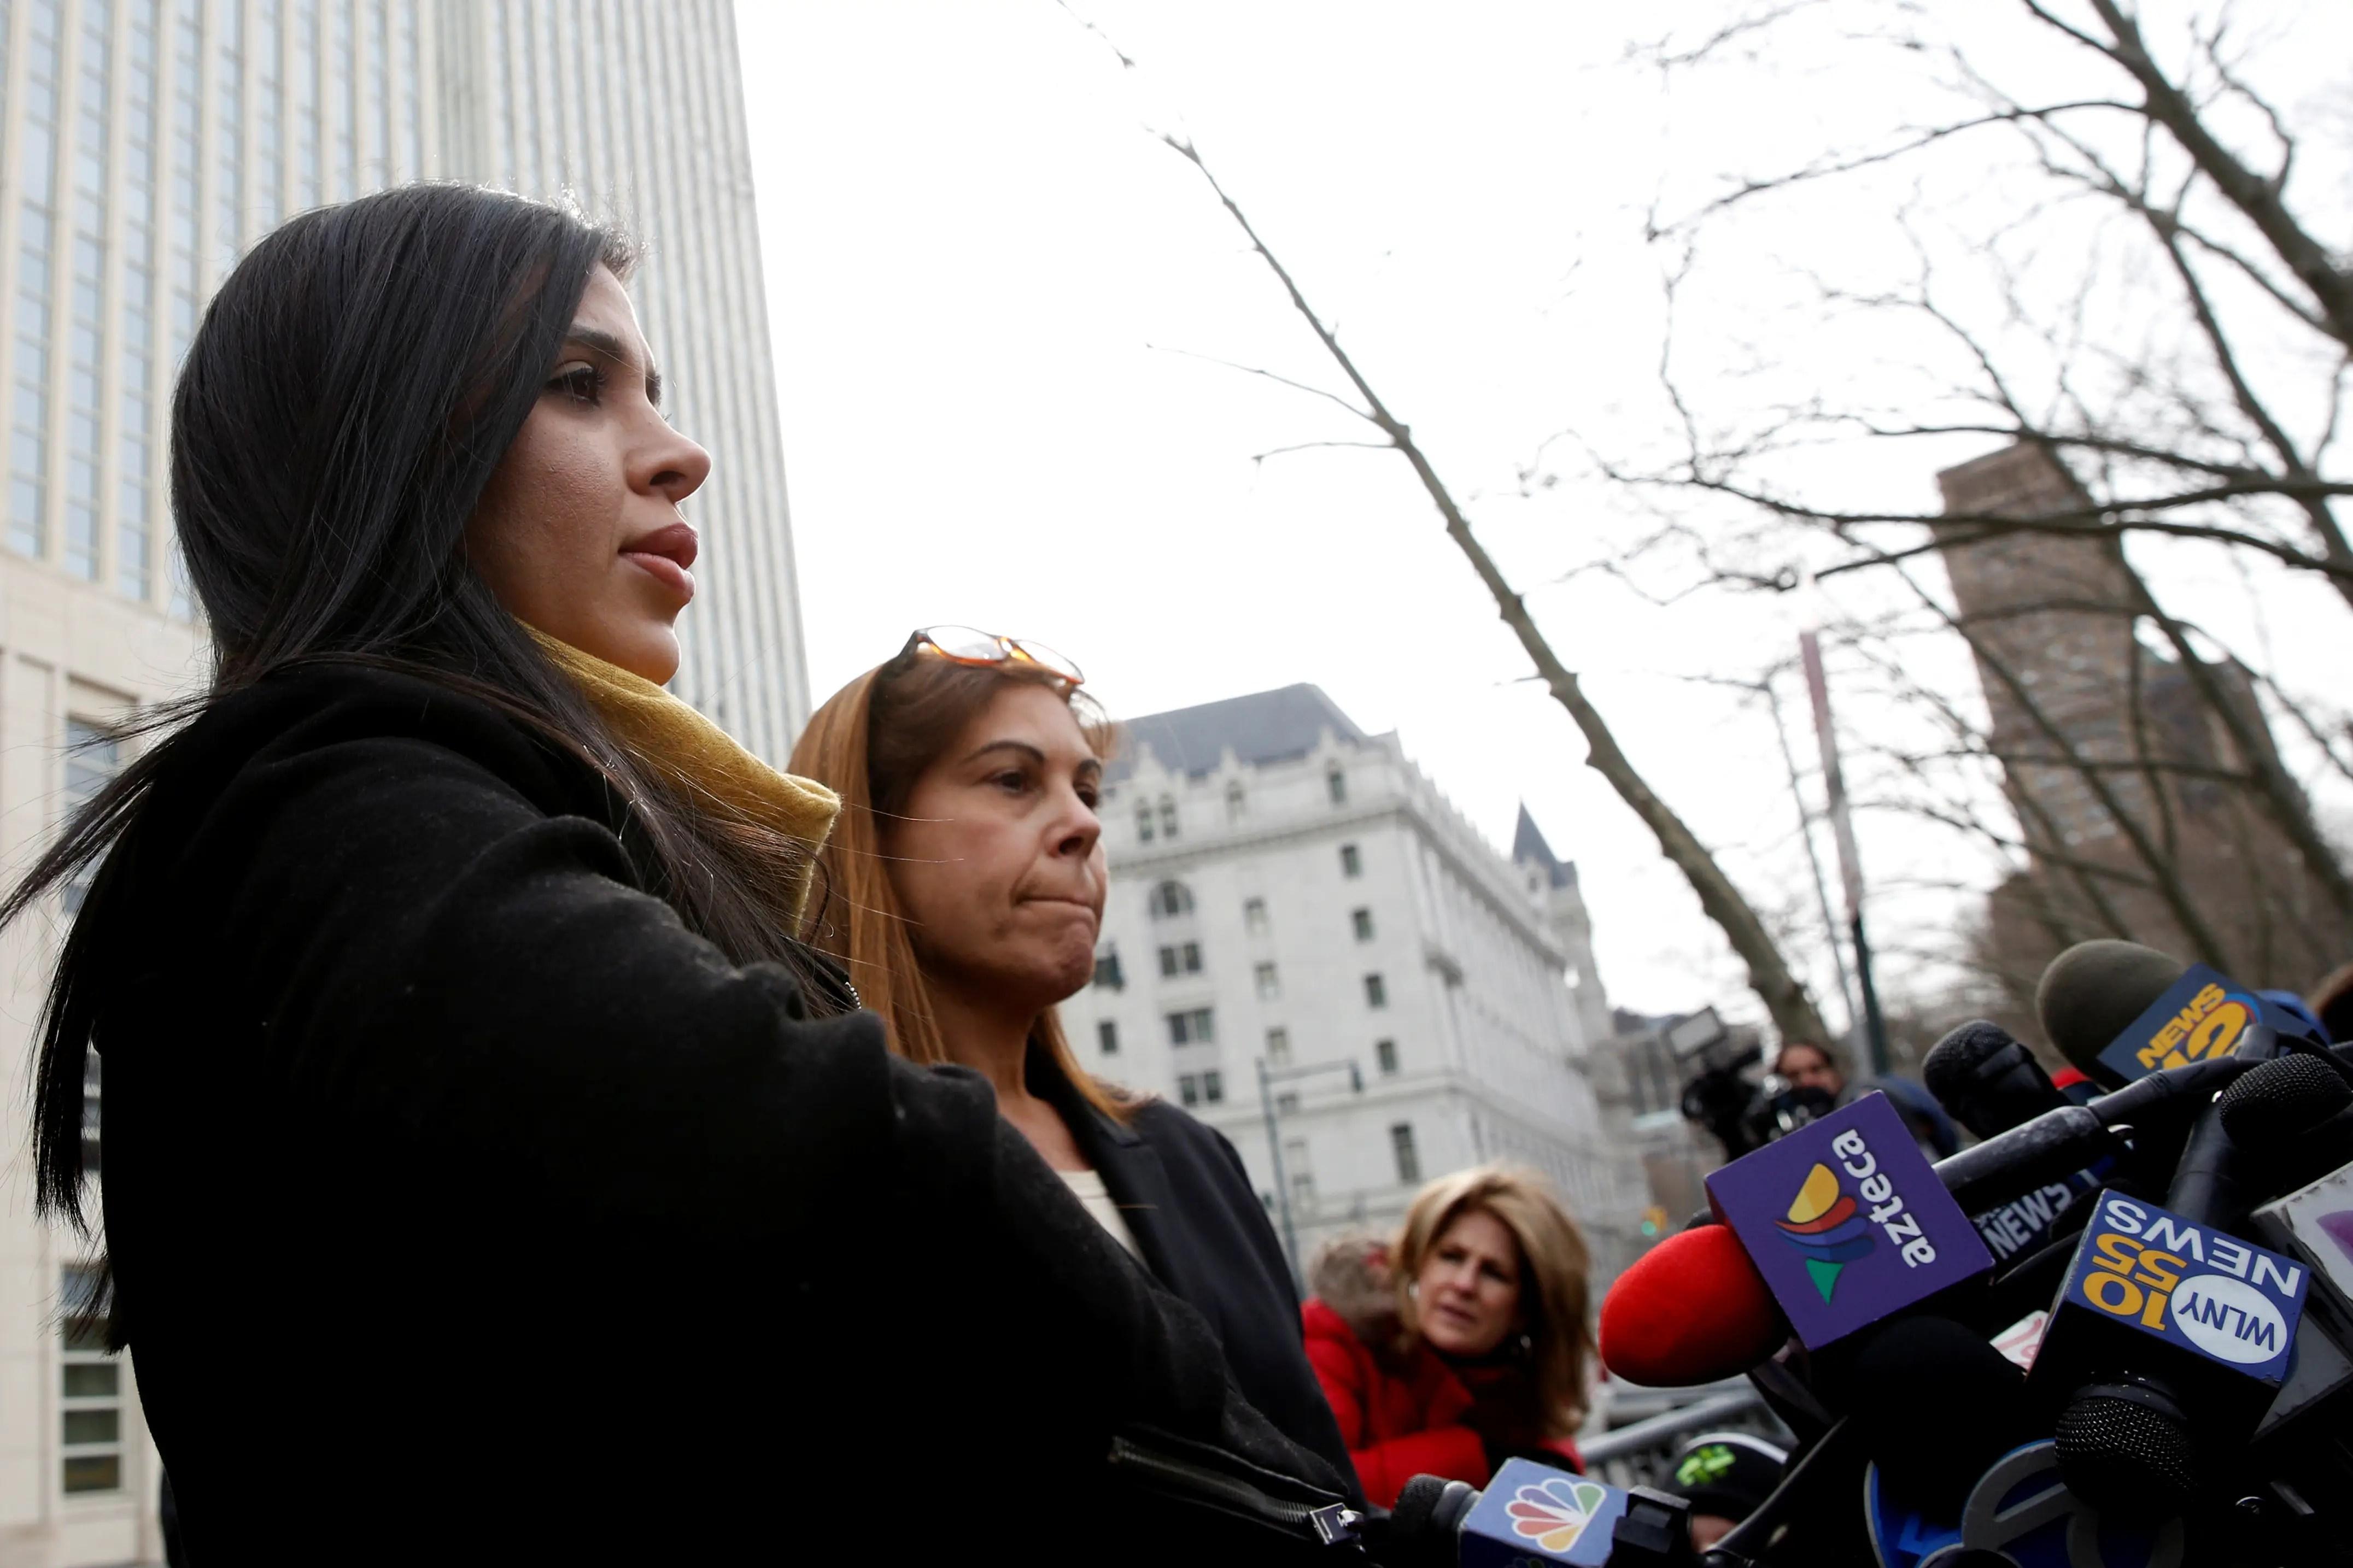 Emma Coronel El Chapo Guzman New York court